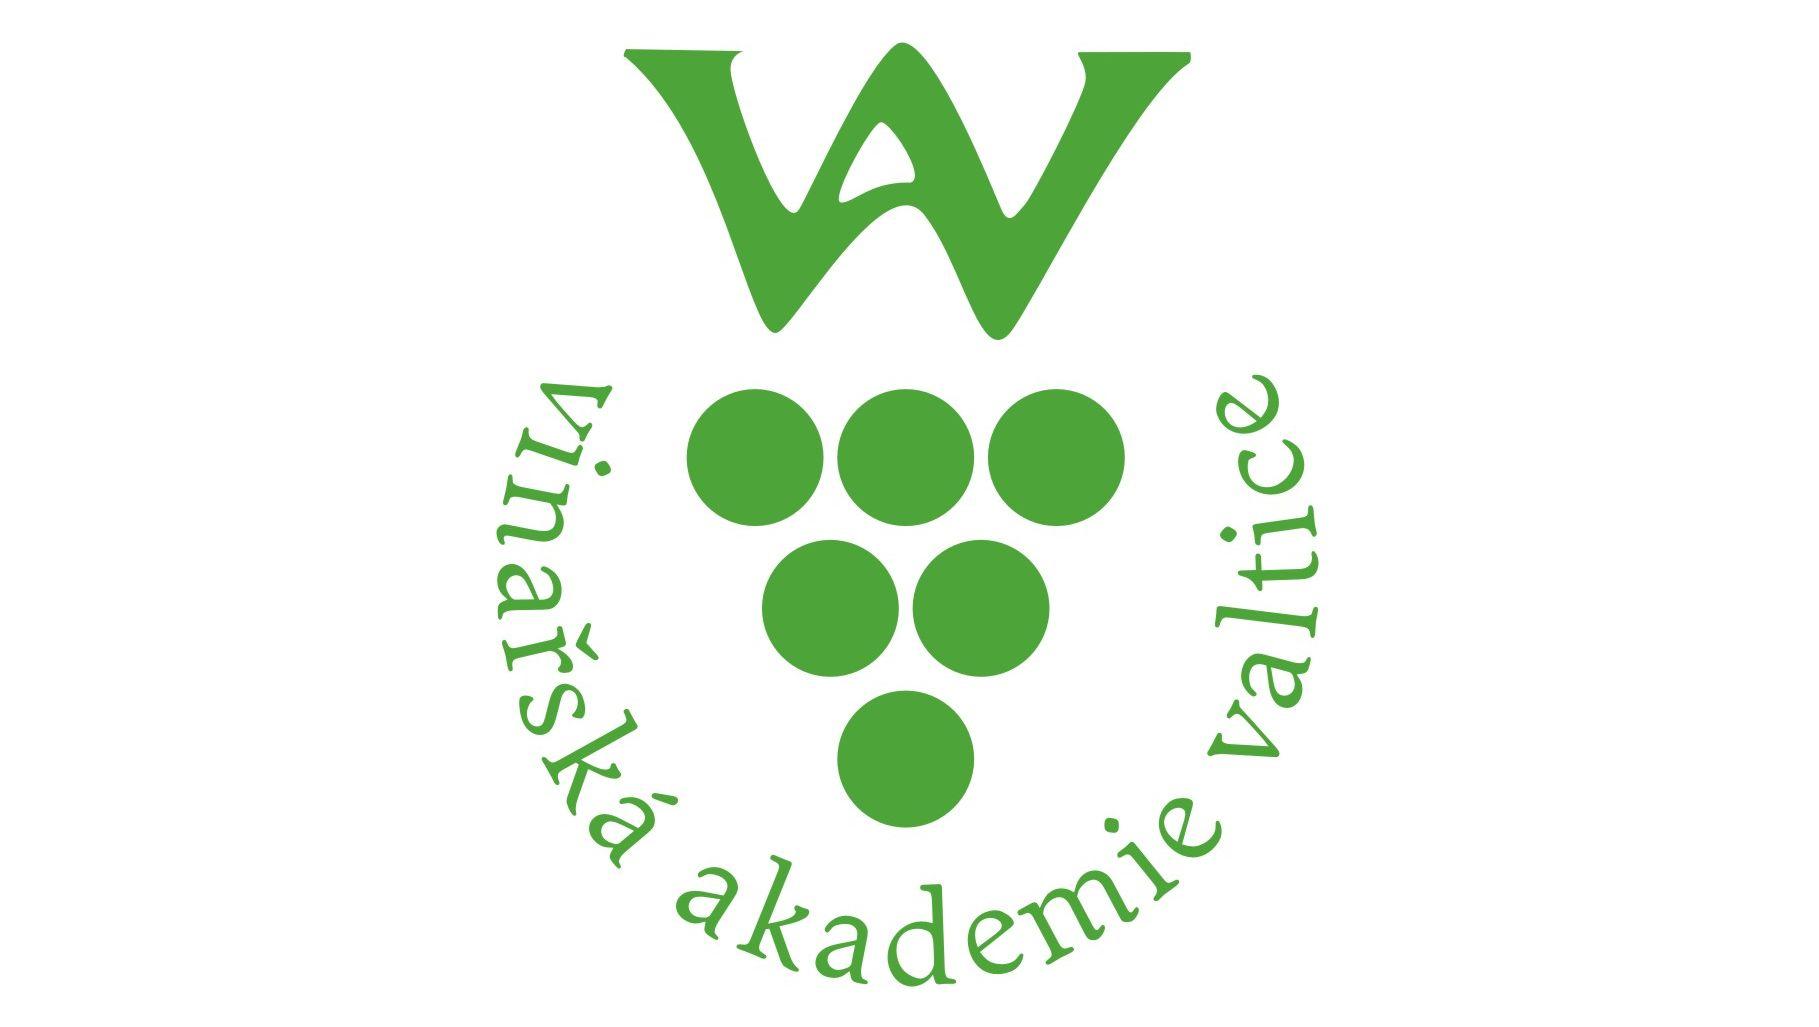 Vinařská akademie I - Kadet